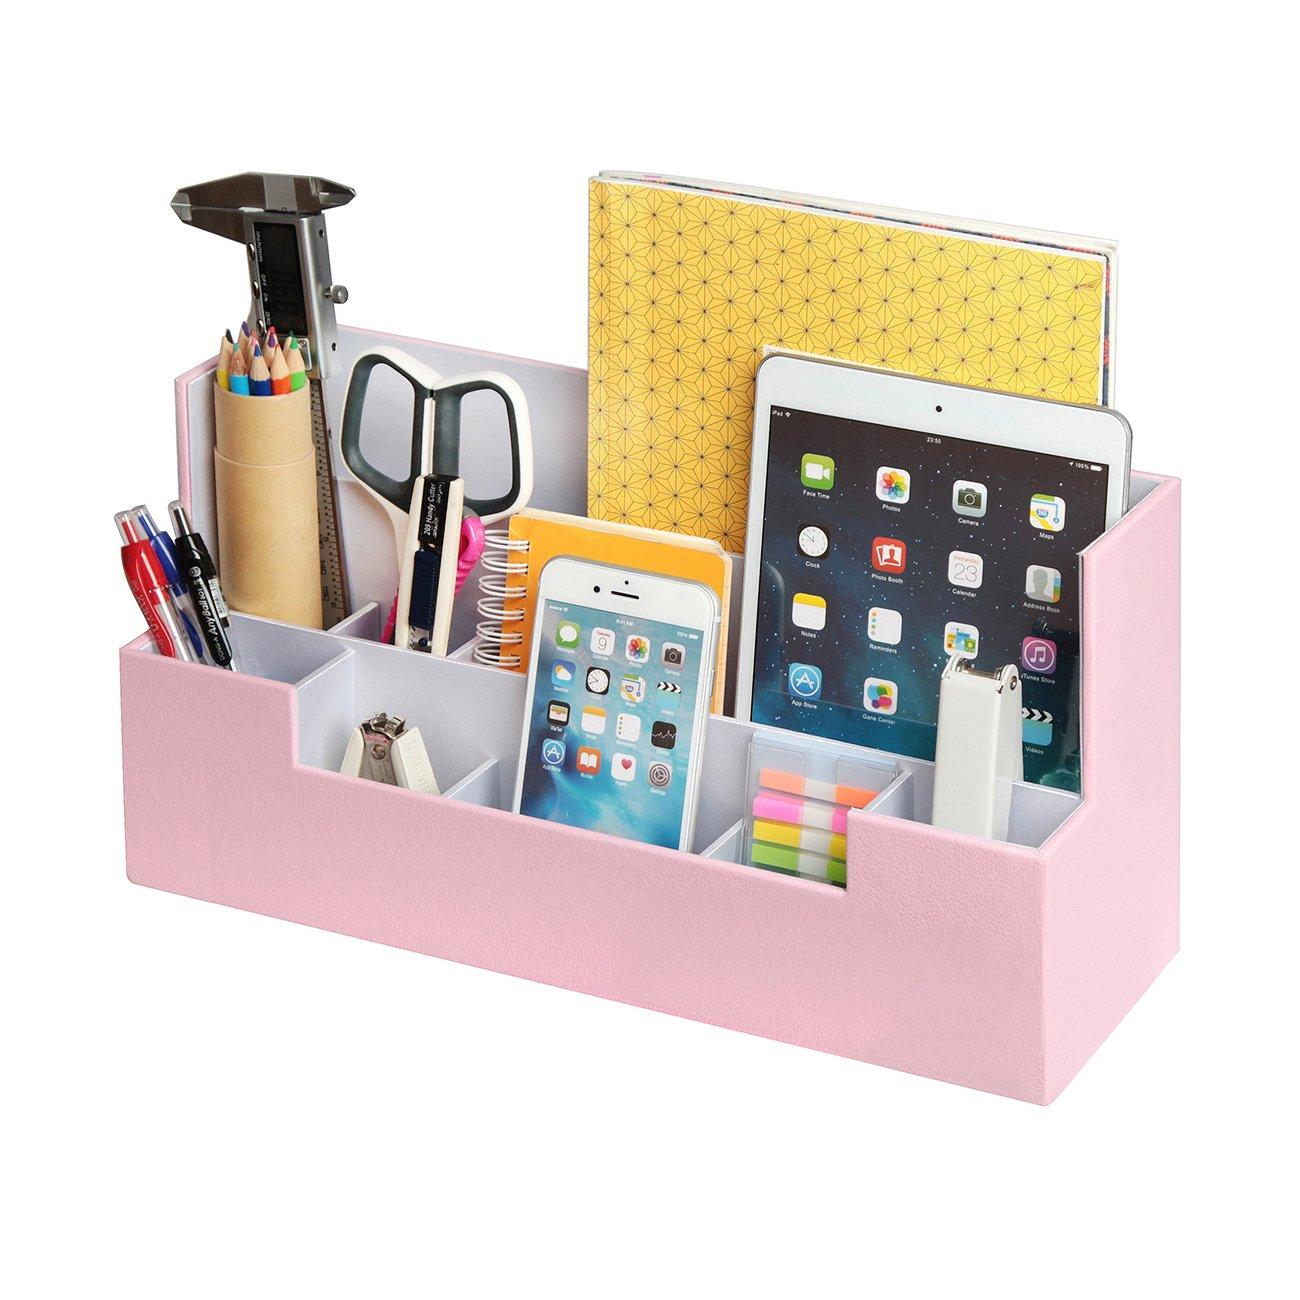 Desk Supplies Office Organizer Caddy (Pink, 13.4 x 5.1 x 7.1 inches) JackCubeDesign-:MK268D